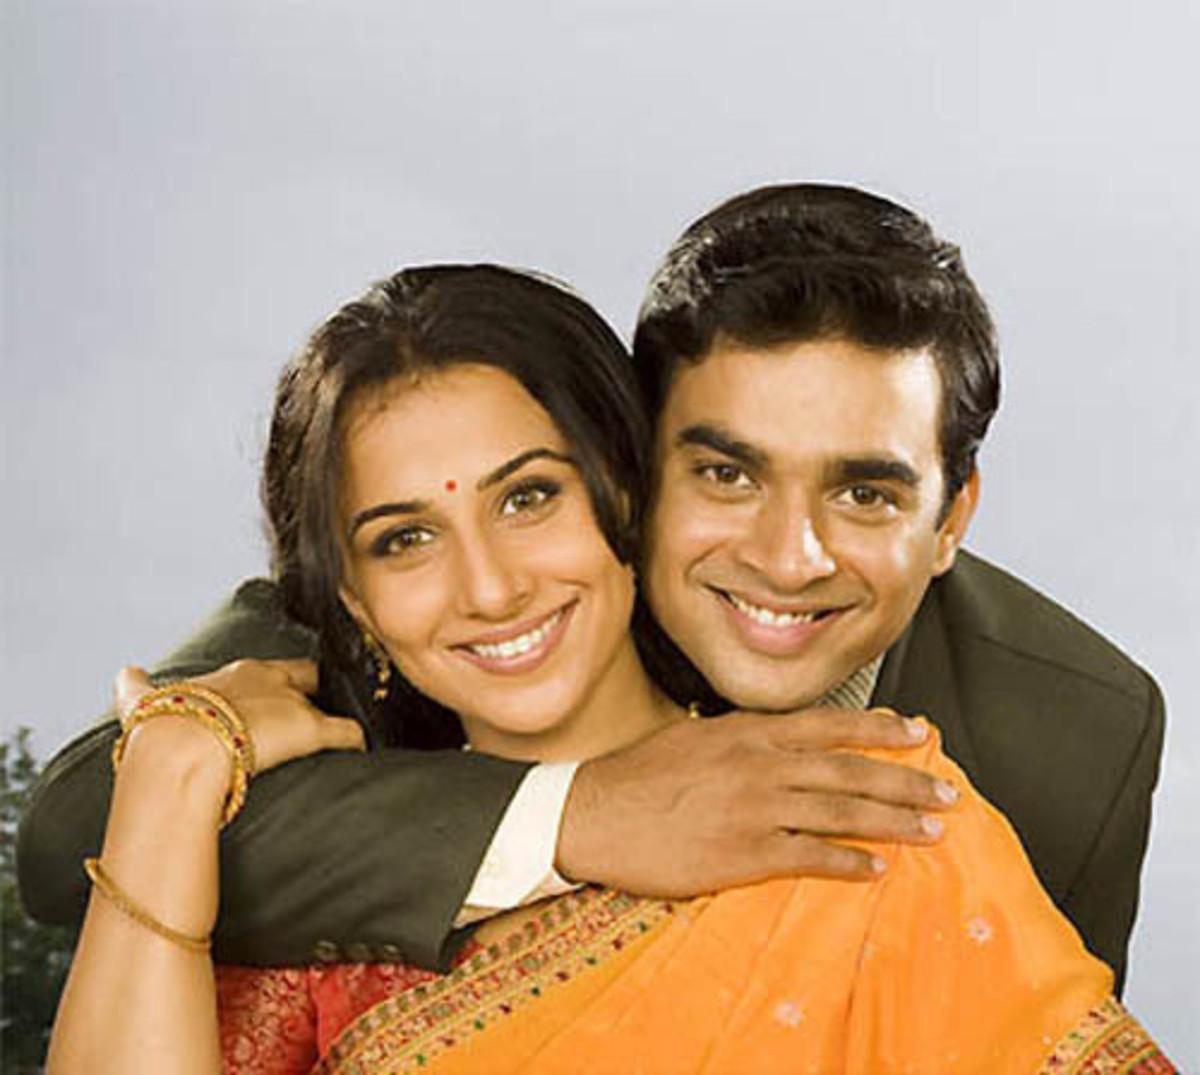 Vidya Balan and R Madhavan in Guru.